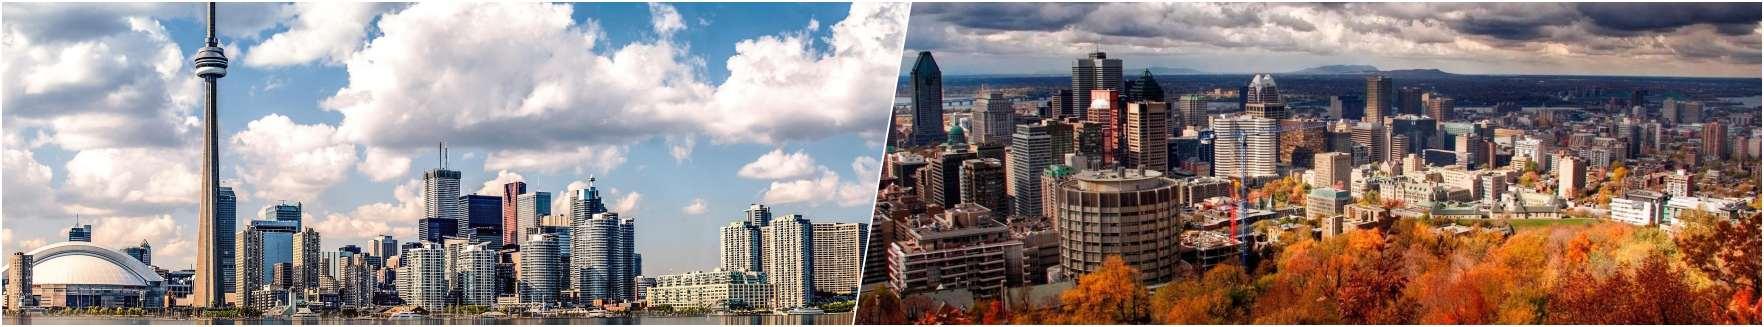 North Canada - NYC - Boston